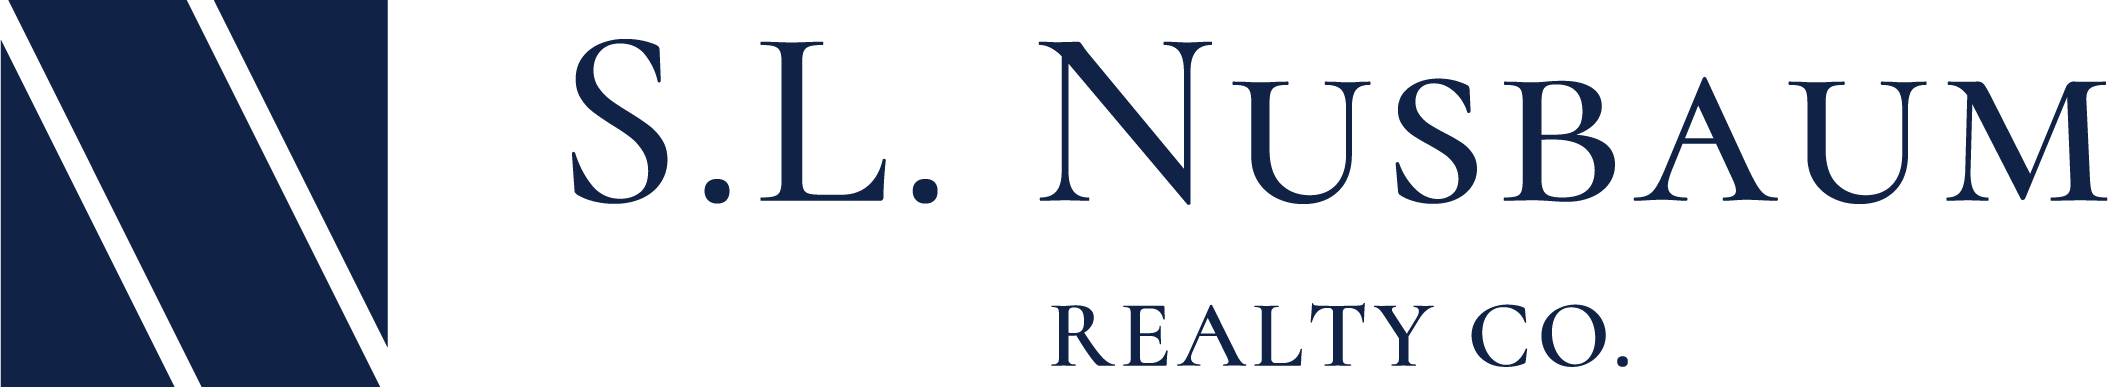 S.L Nusbaum Realty Co. logo